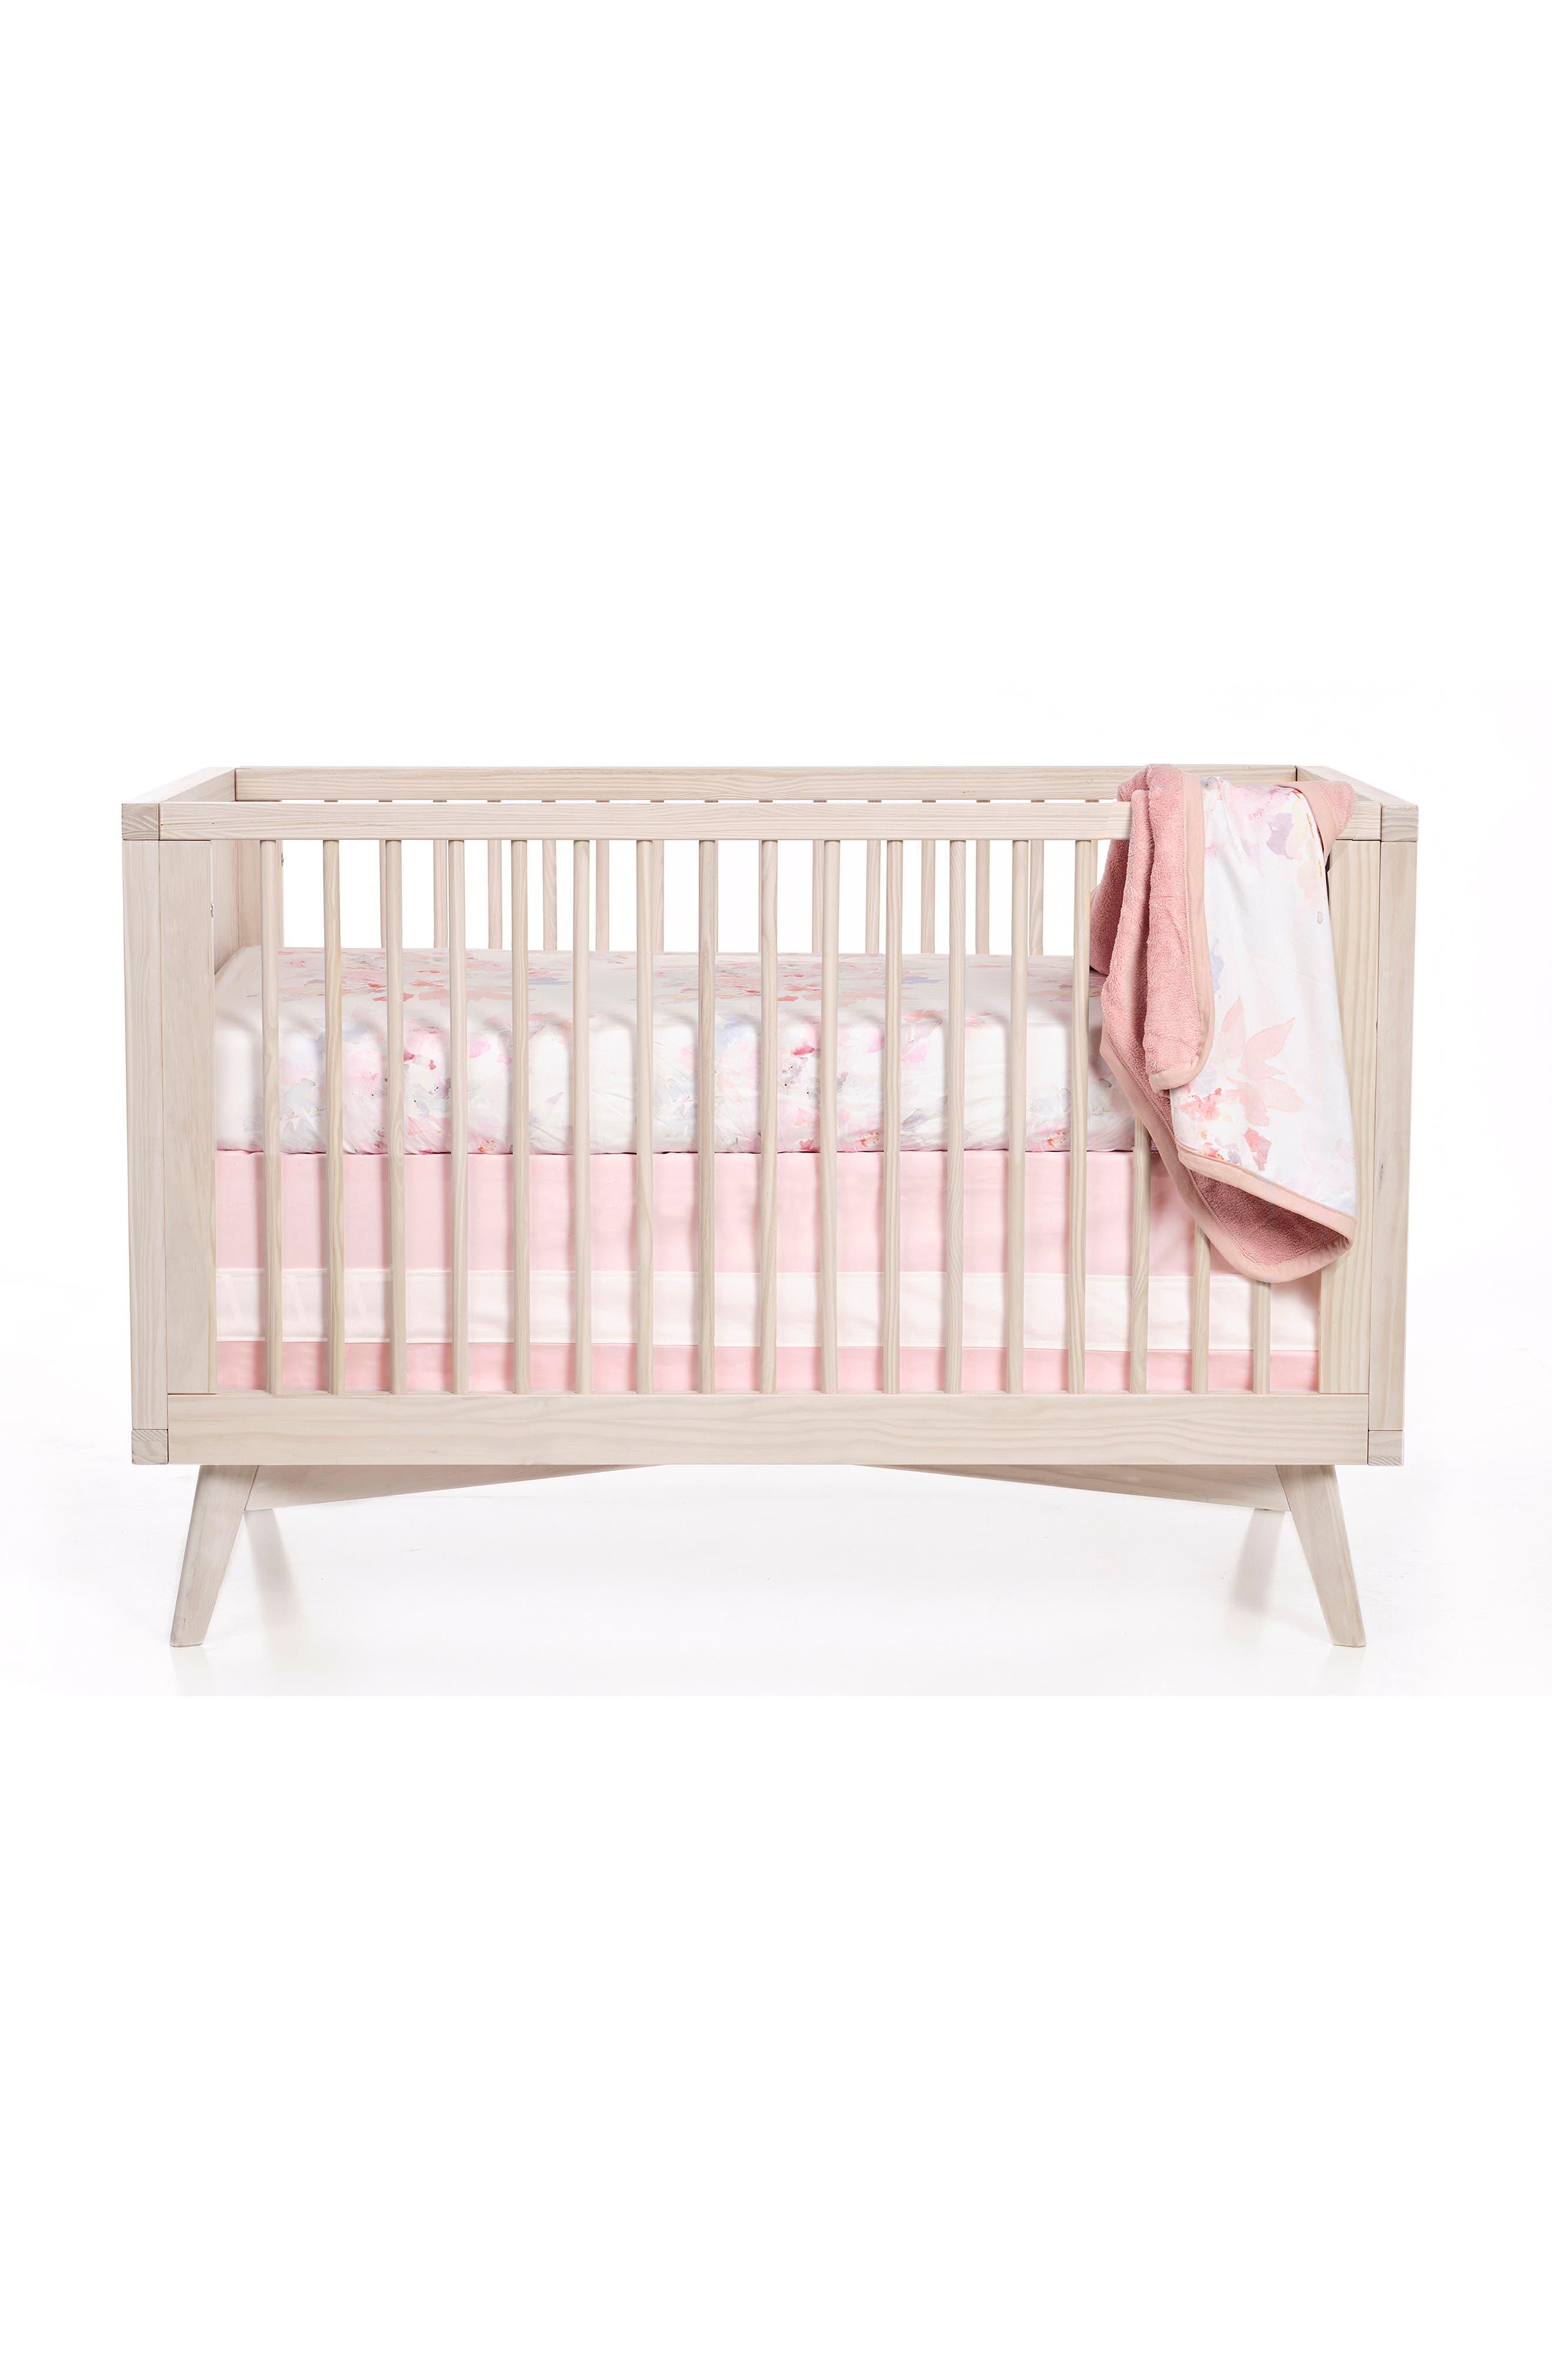 OILO, Prim Cuddle Blanket, Crib Skirt & Crib Sheet Set, Alternate thumbnail 6, color, PRIM